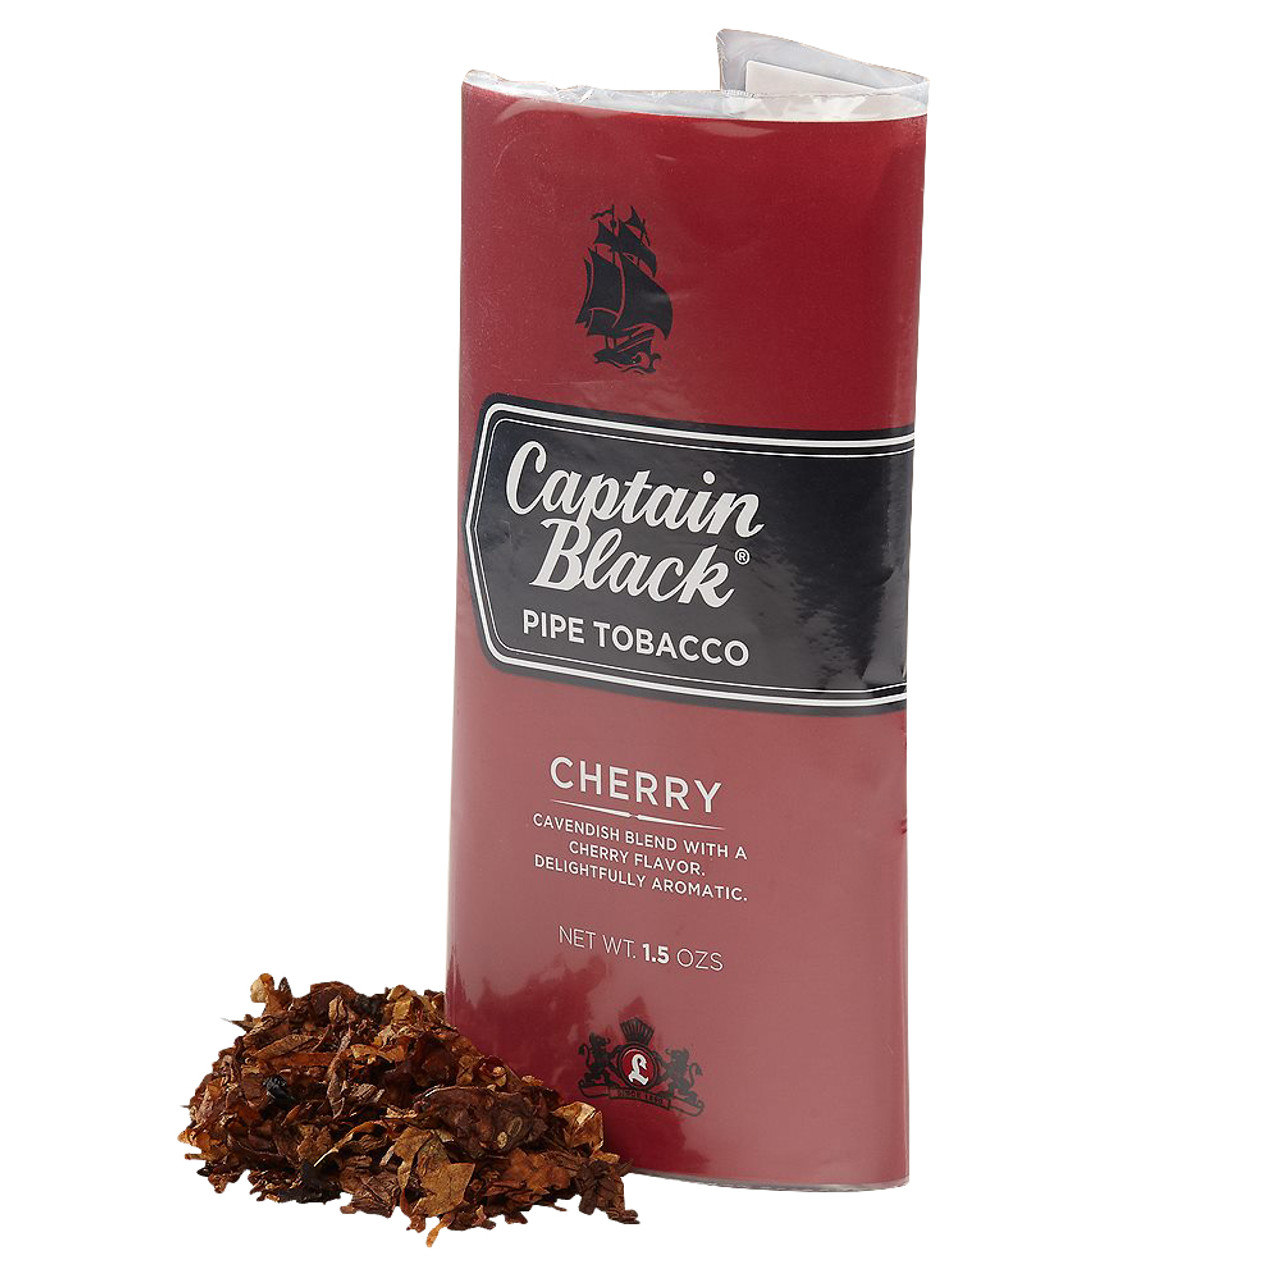 Captain Black Cherry Pipe Tobacco   1.5 OZ POUCHES - 6 COUNT